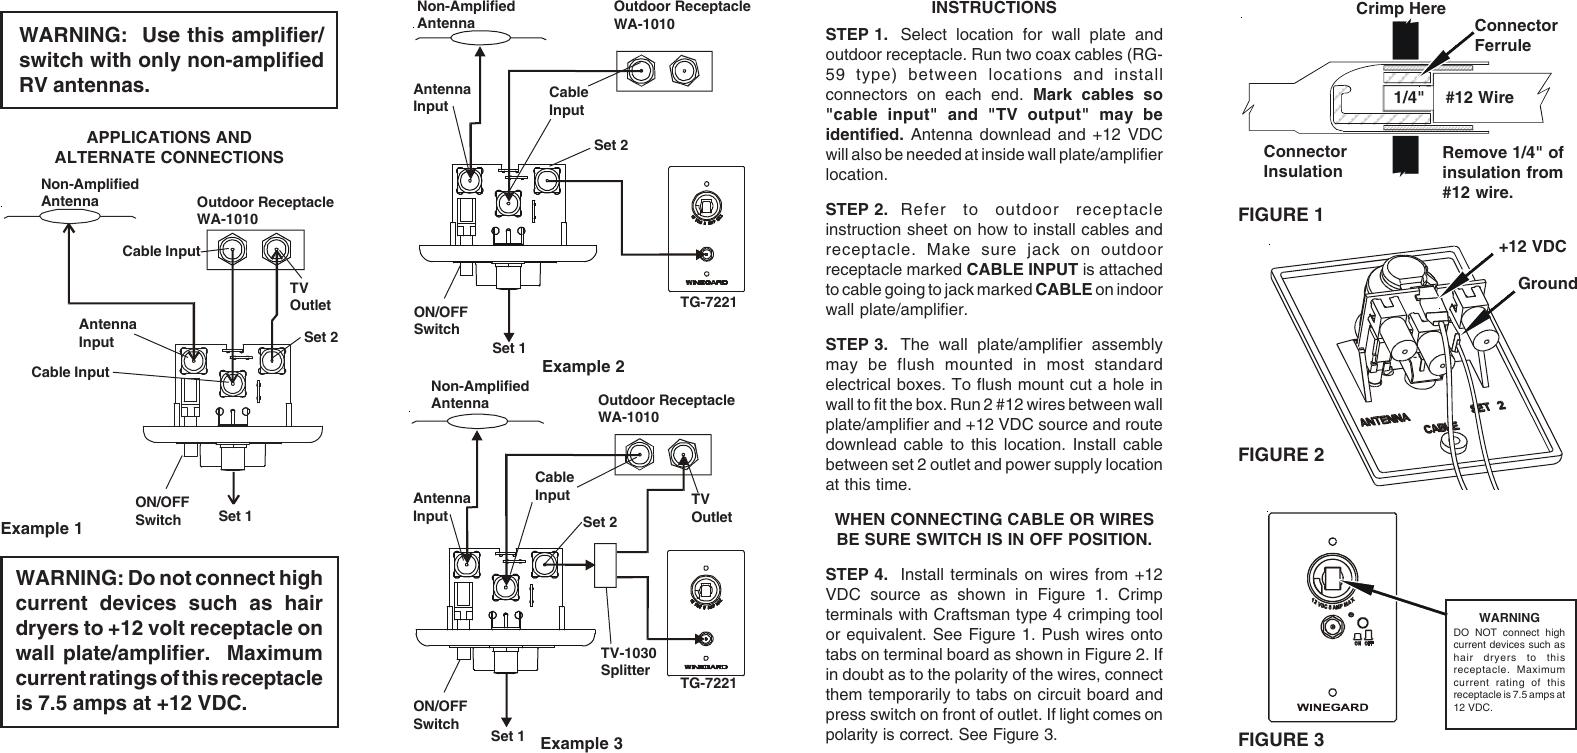 Winegard Satellite Tv System Ra 7296 Users Manual 2451489 Wiring Diagram